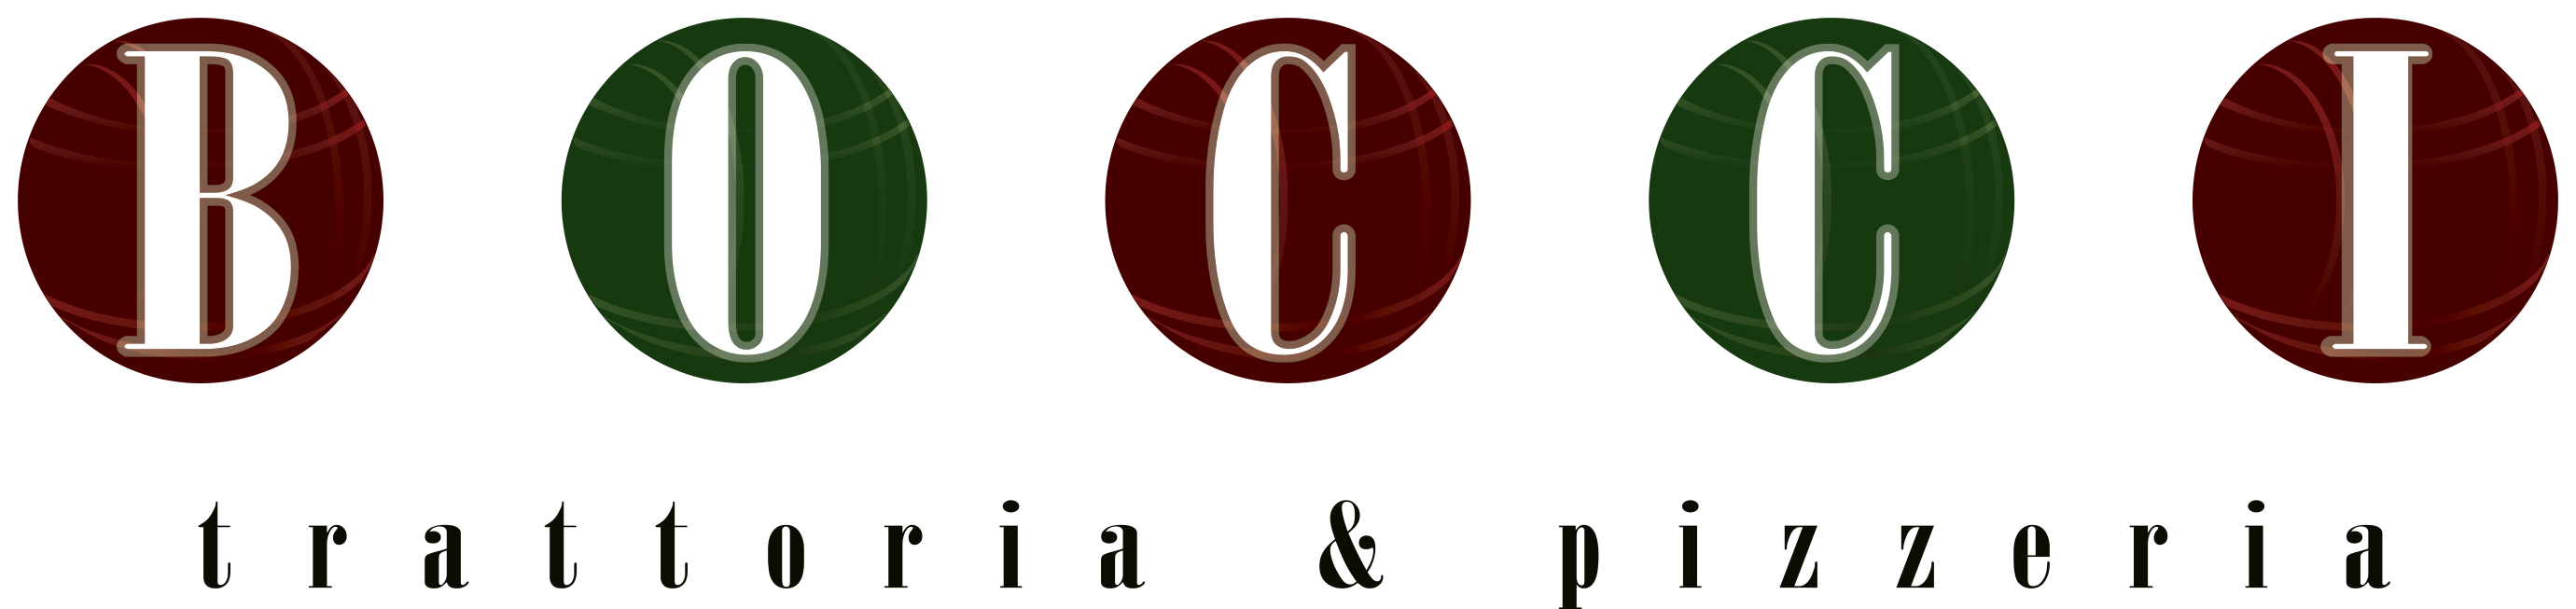 Bocci Italian Restaurant